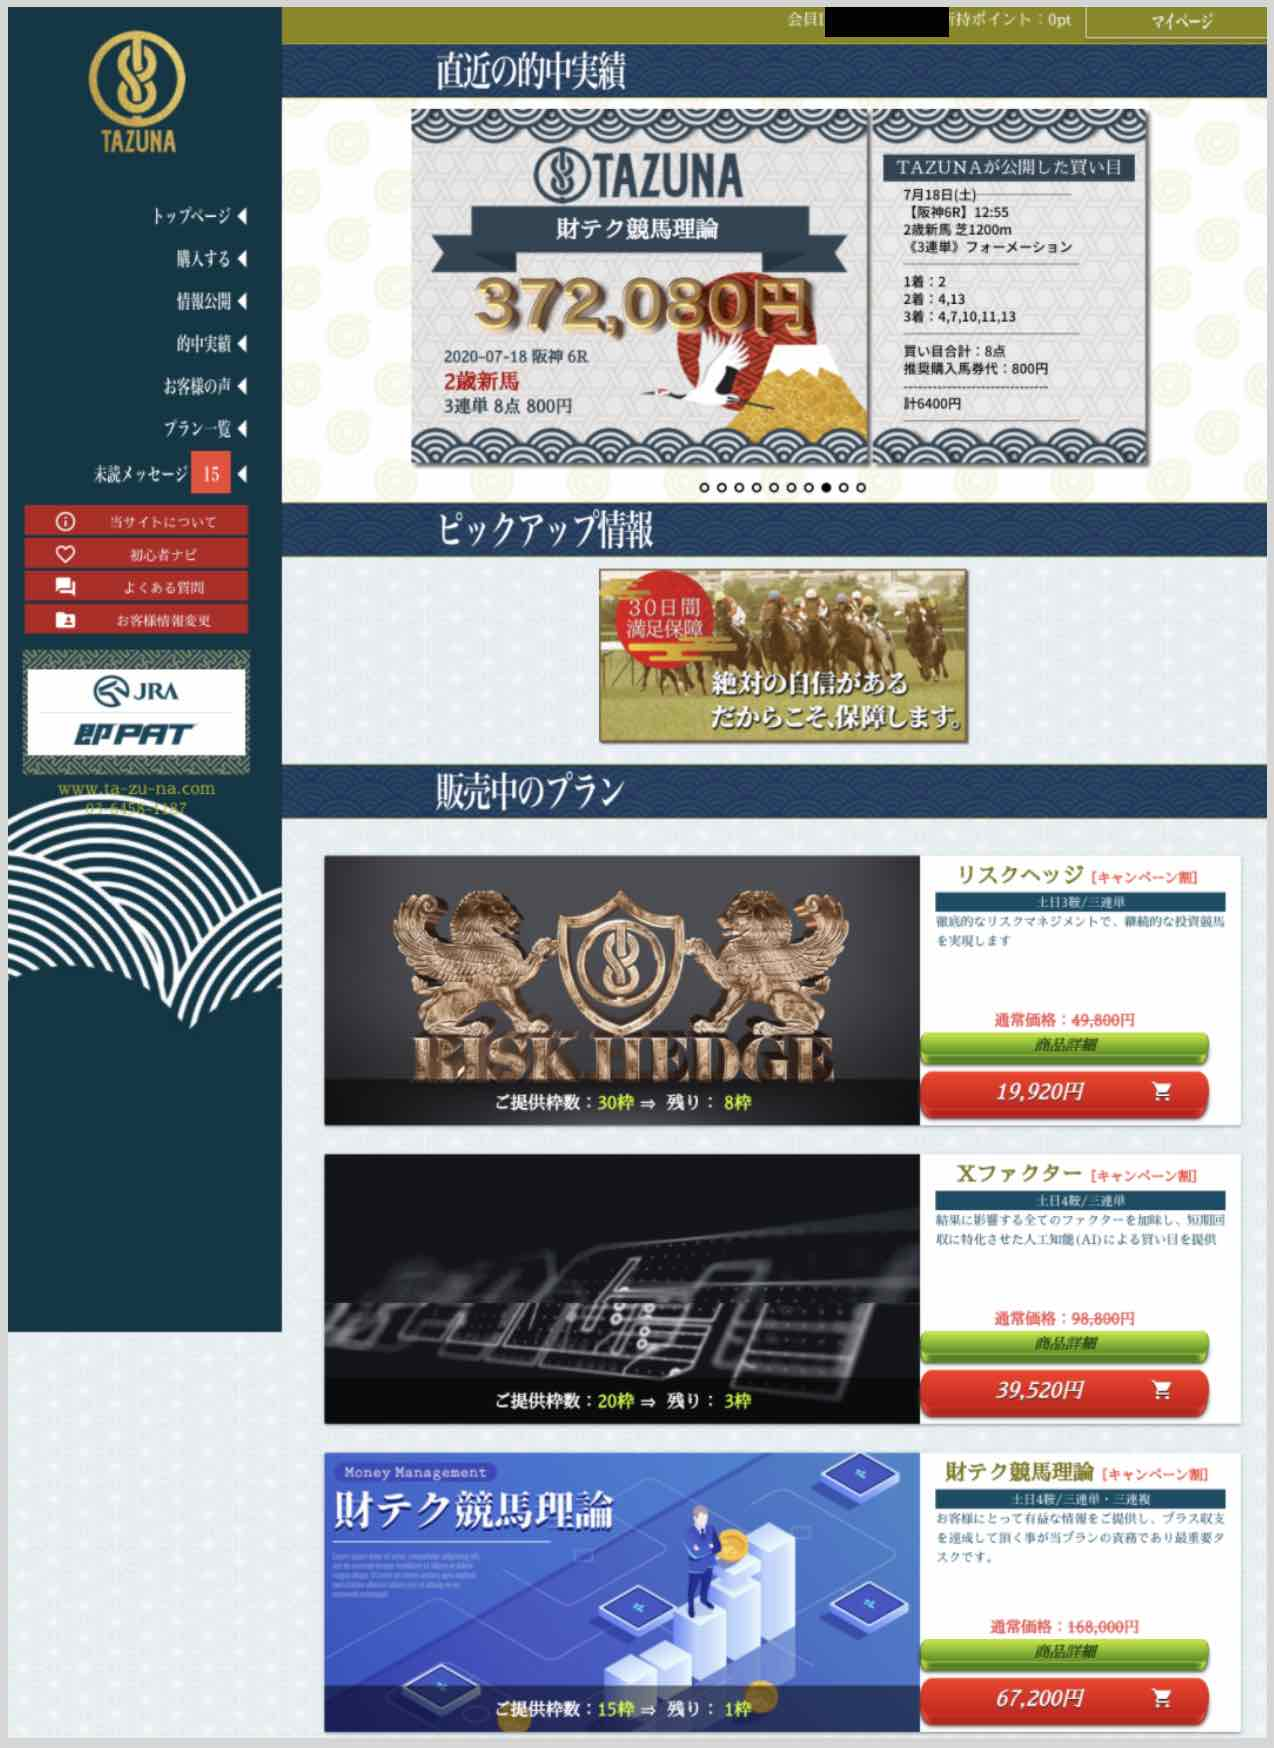 TAZUNA(たづな)という競馬予想サイトの会員ページ